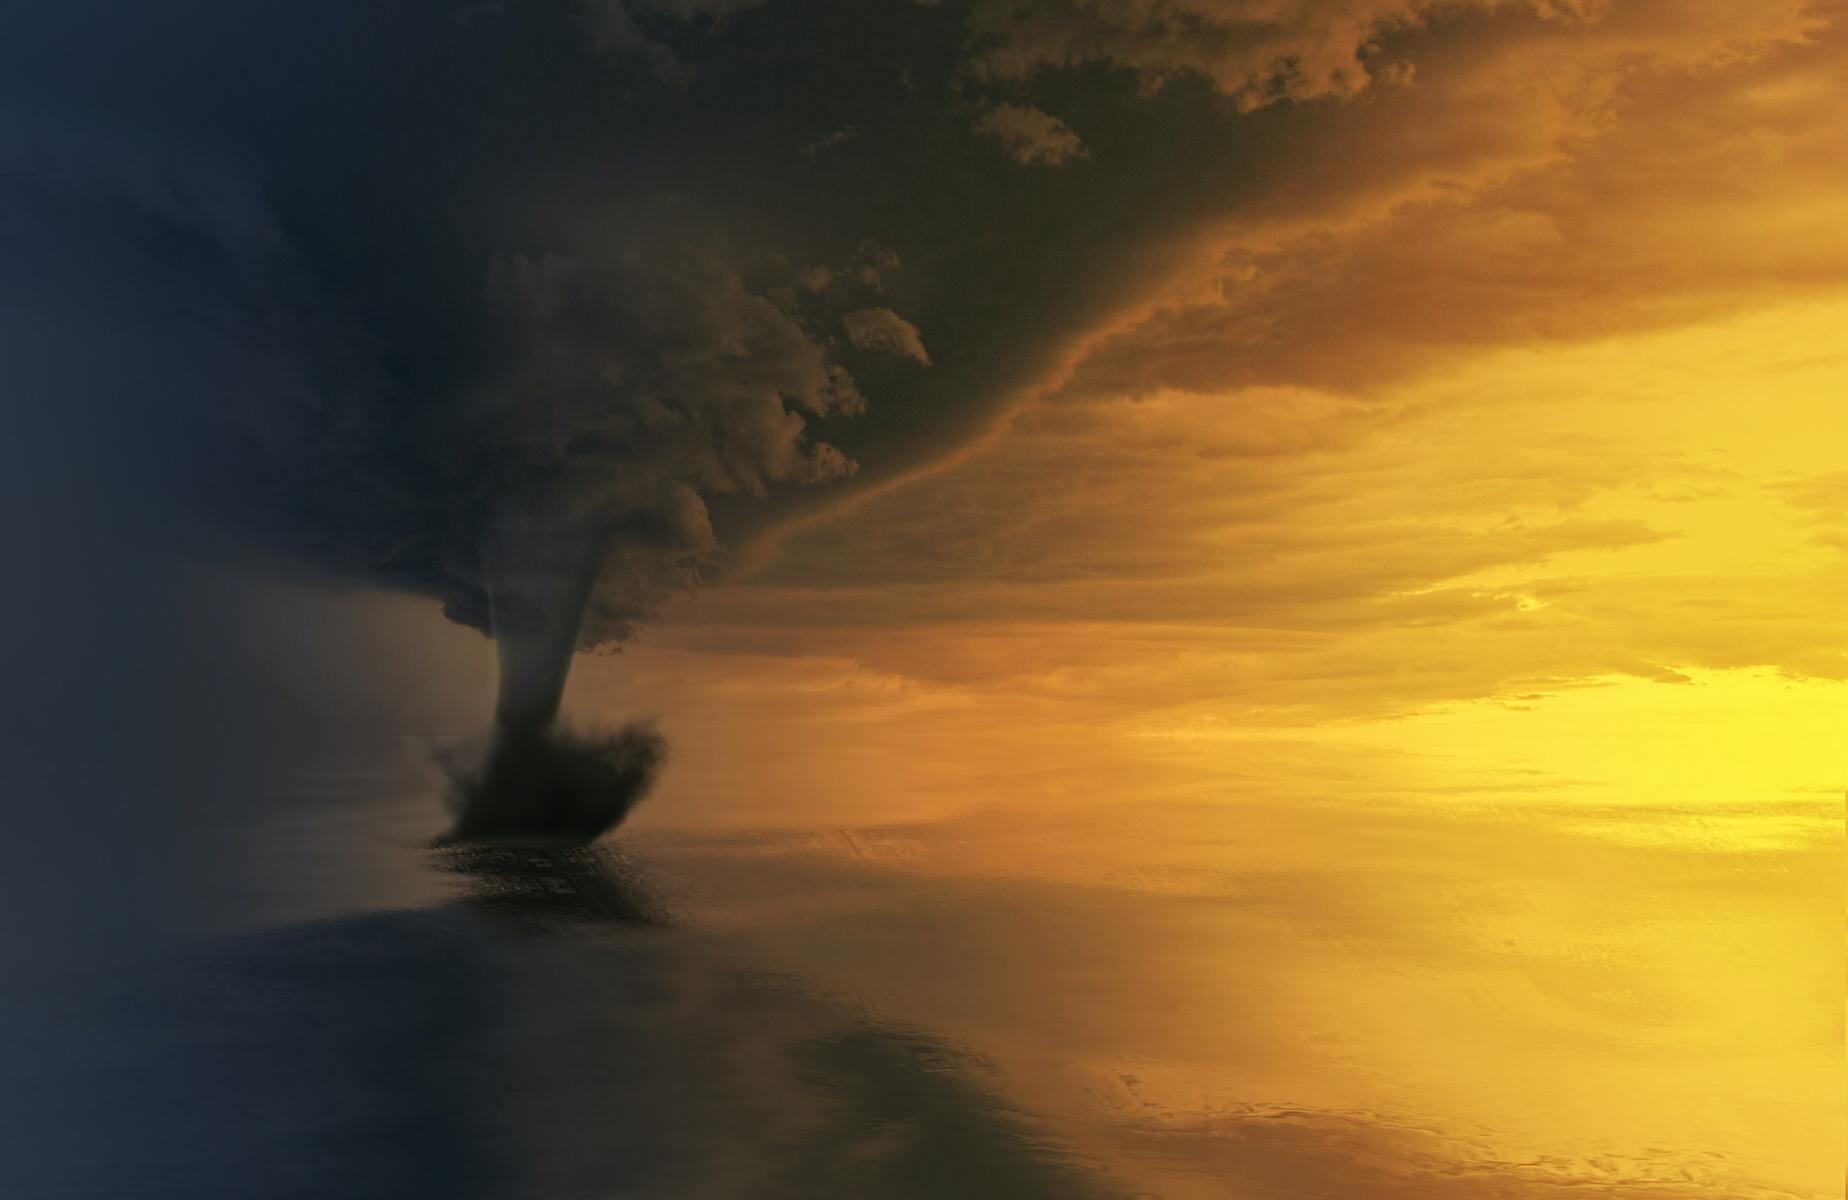 Jane Rimmer: From inside the tornado to portmanteau career